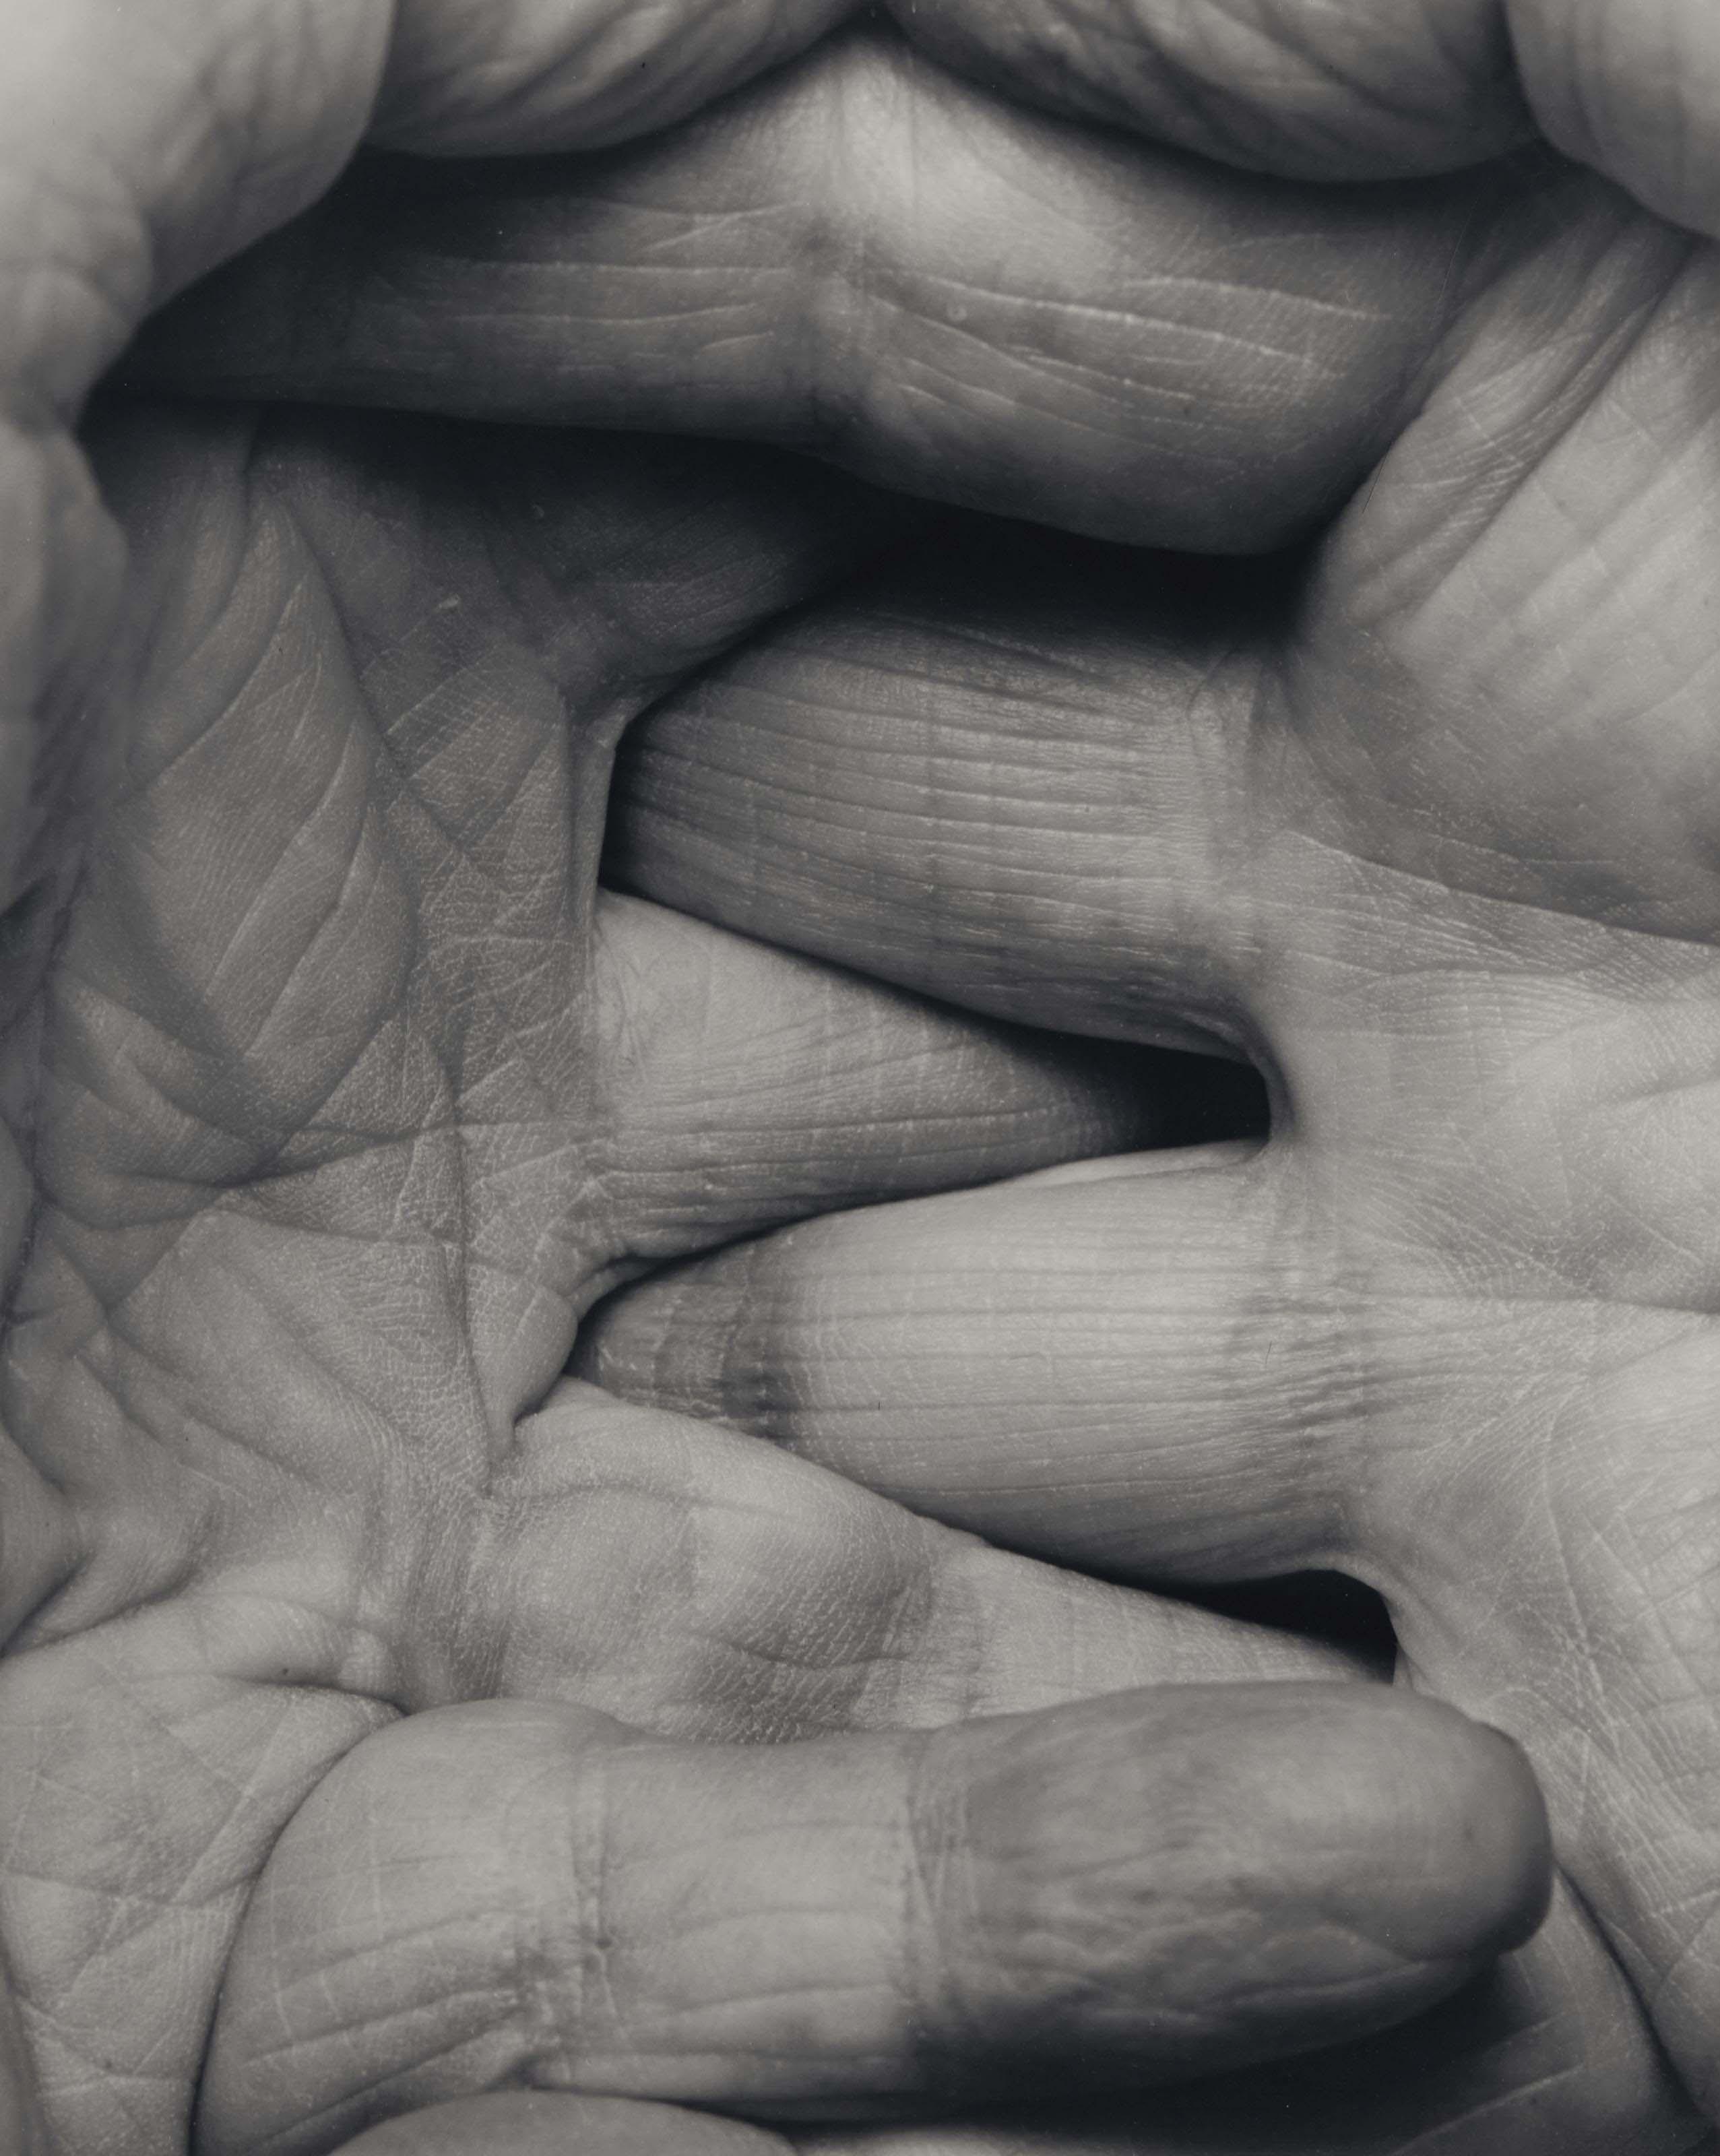 SP 40 99 Interlocking Fingers n. 10, 1999